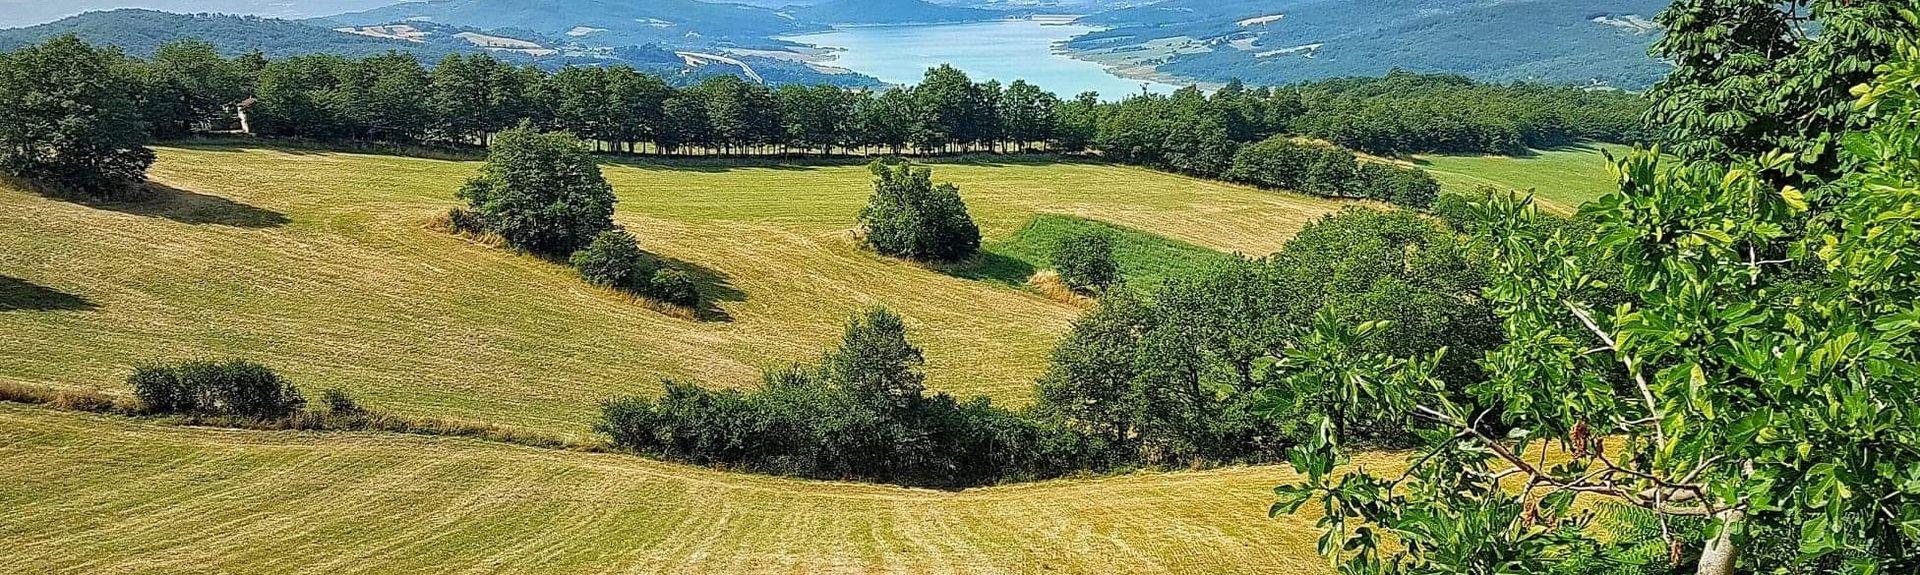 Anghiari, Toscana, Italien